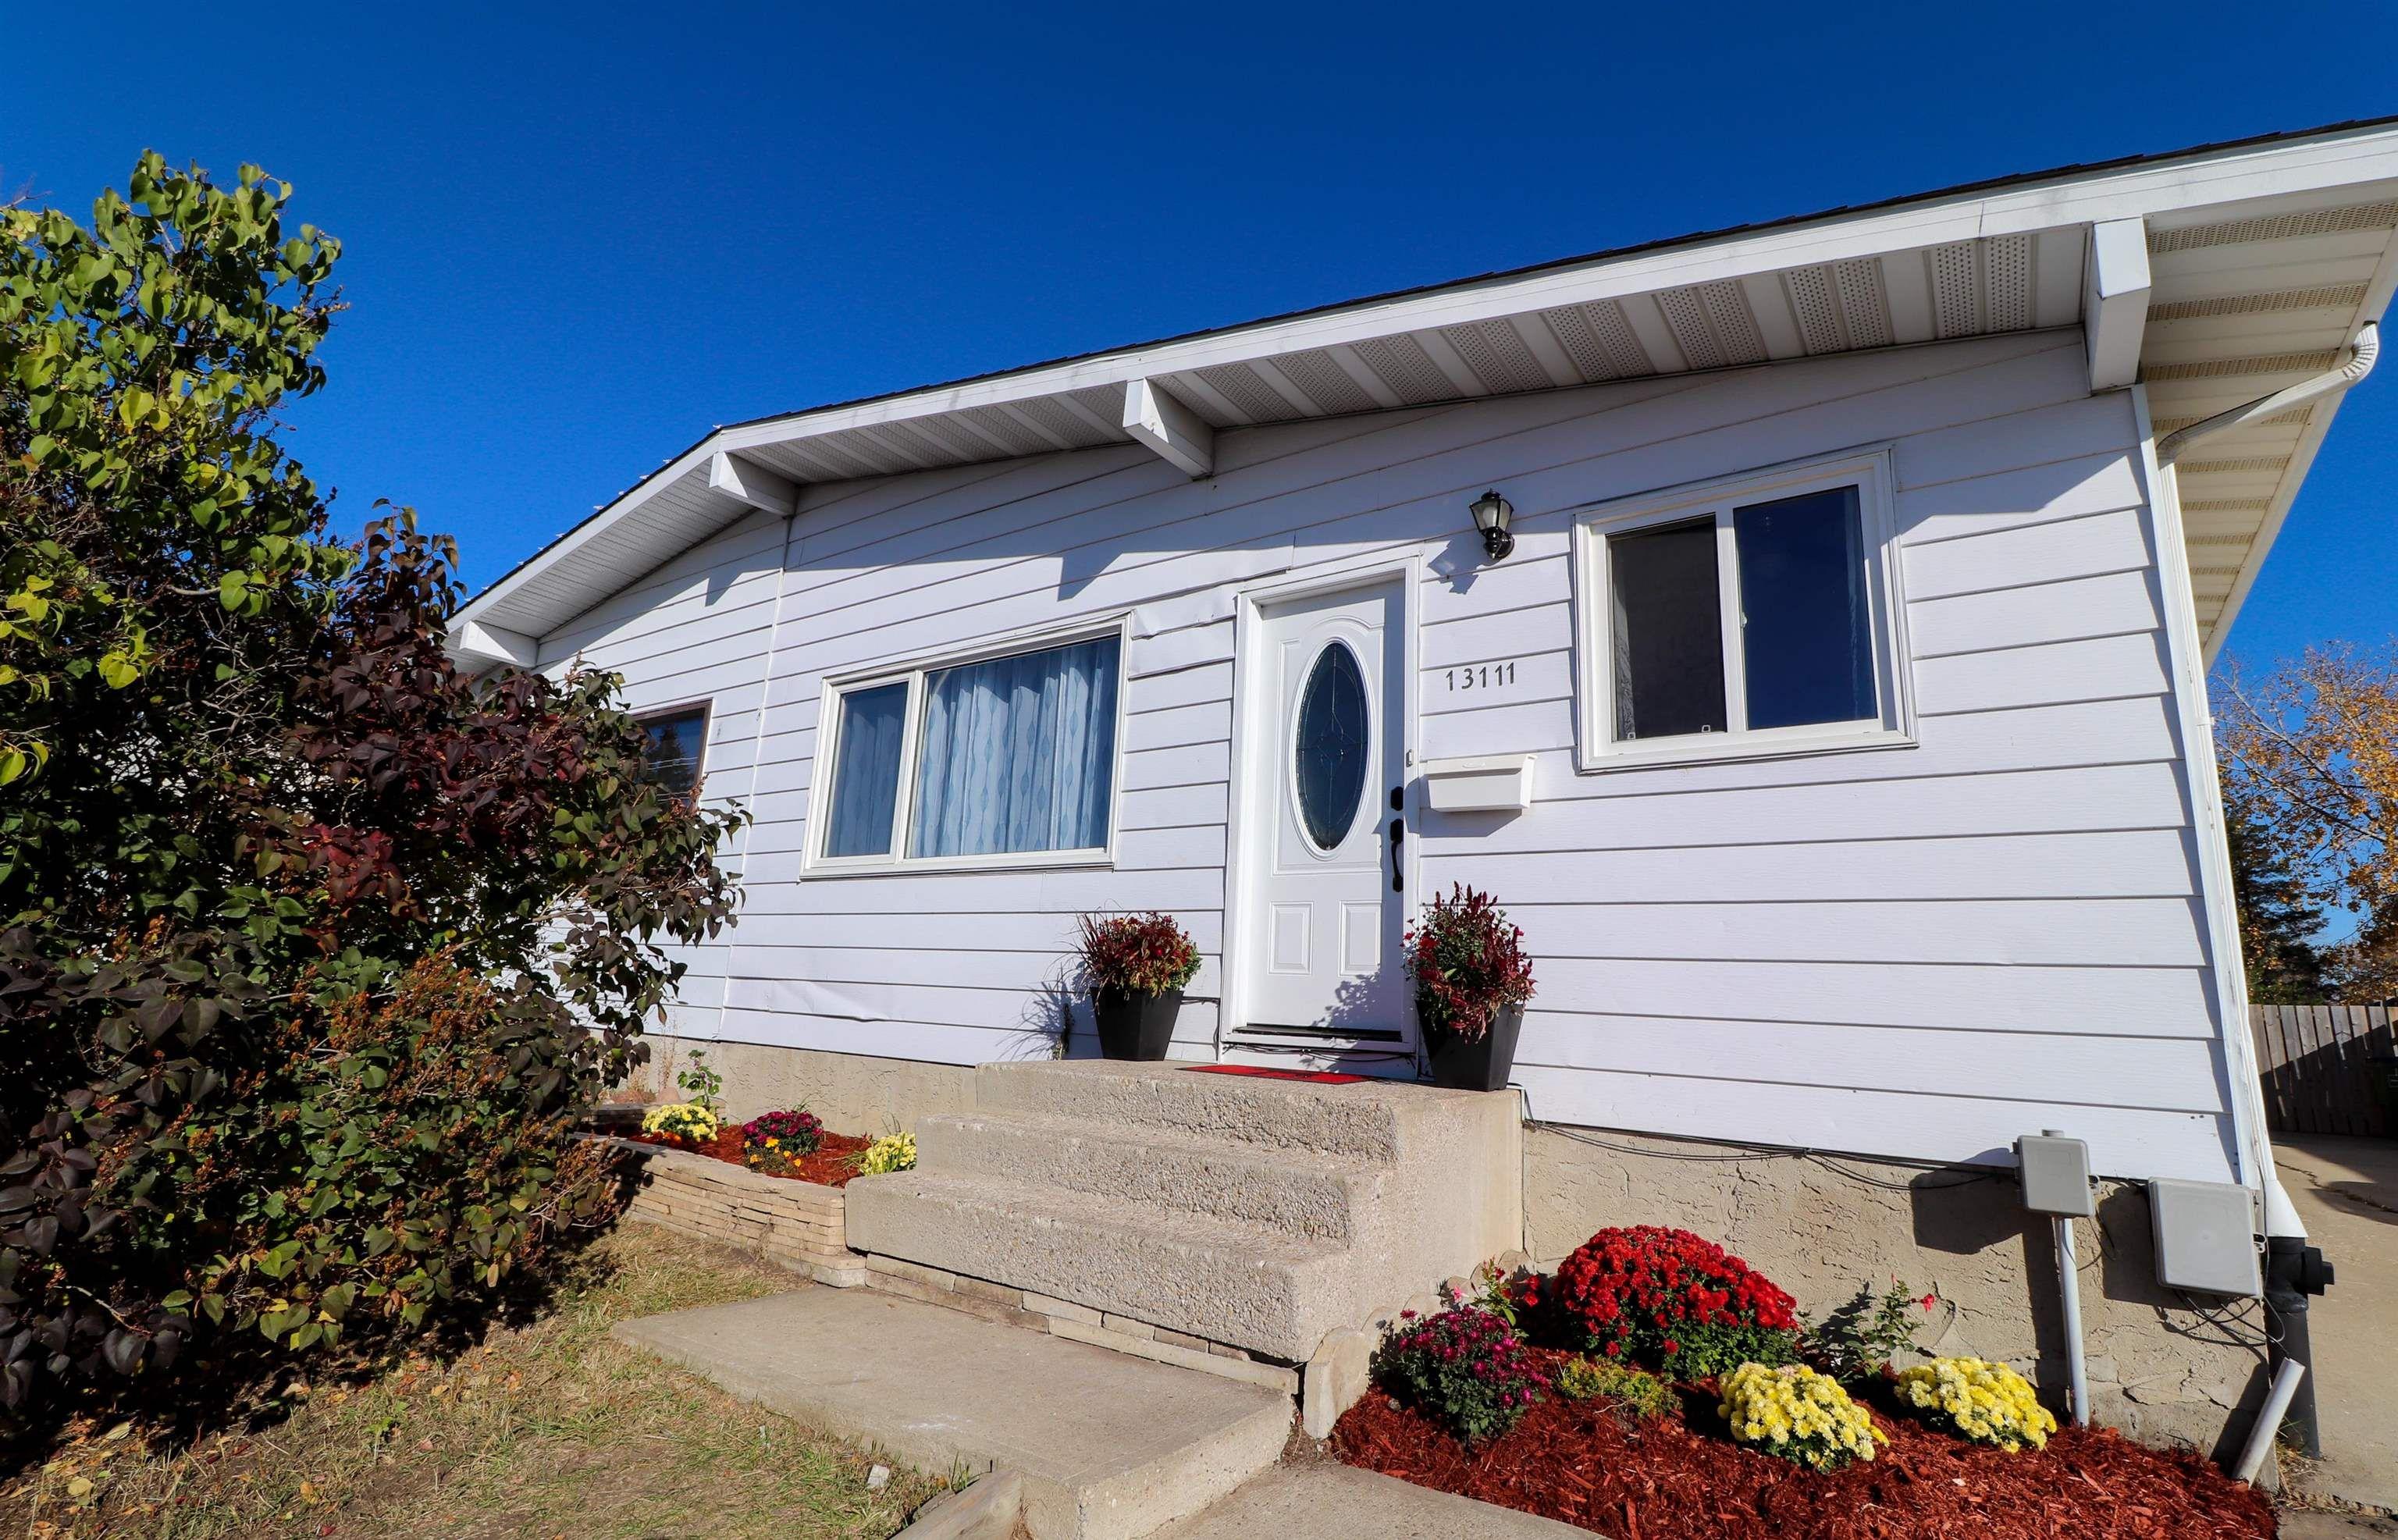 Main Photo: 13111 30 Street in Edmonton: Zone 35 House Half Duplex for sale : MLS®# E4266269